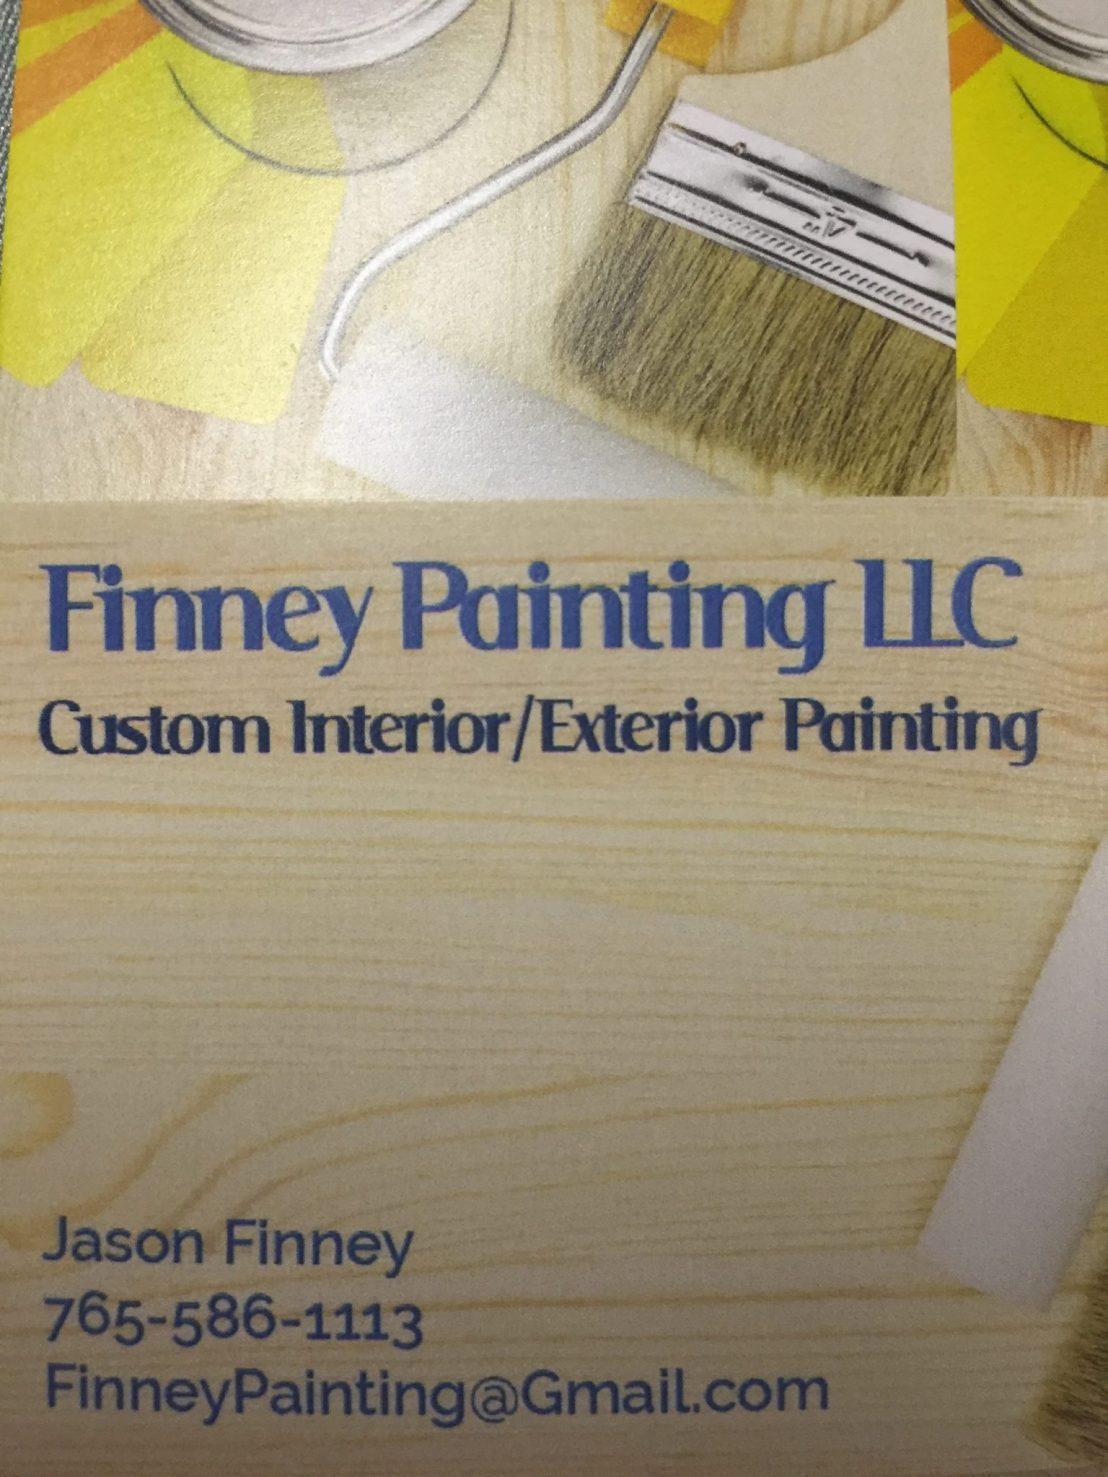 Finney Painting